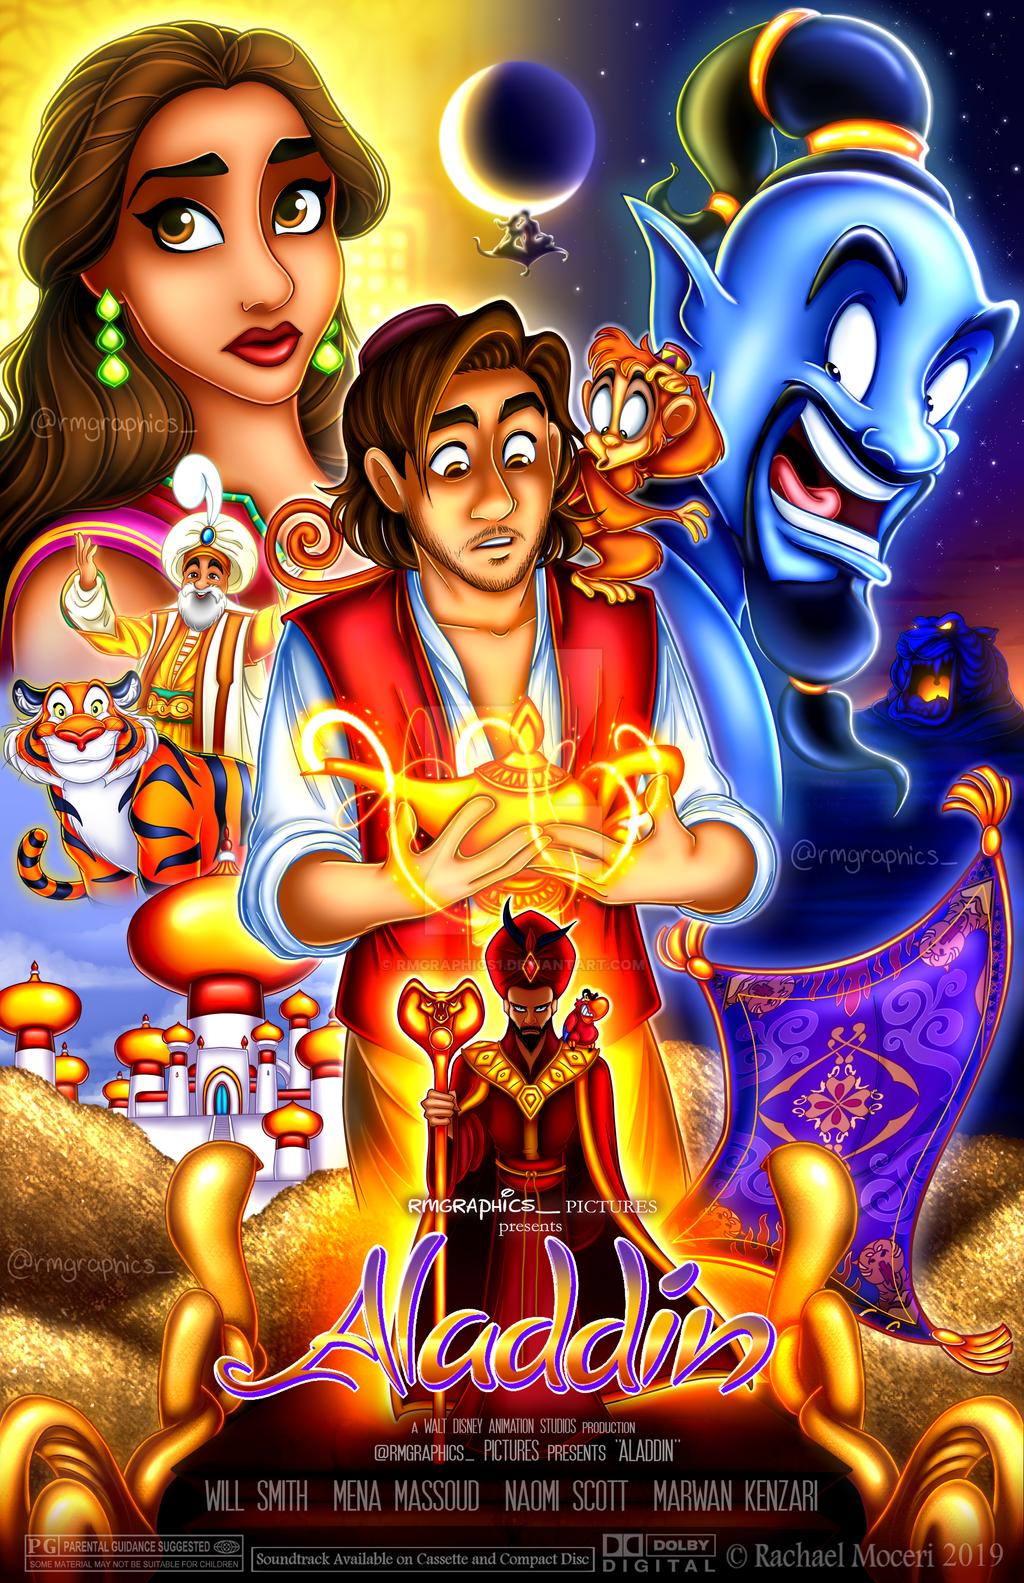 Aladdin 2019 demake poster by rmgraphics1 on deviantart - Aladdin 2019 poster ...